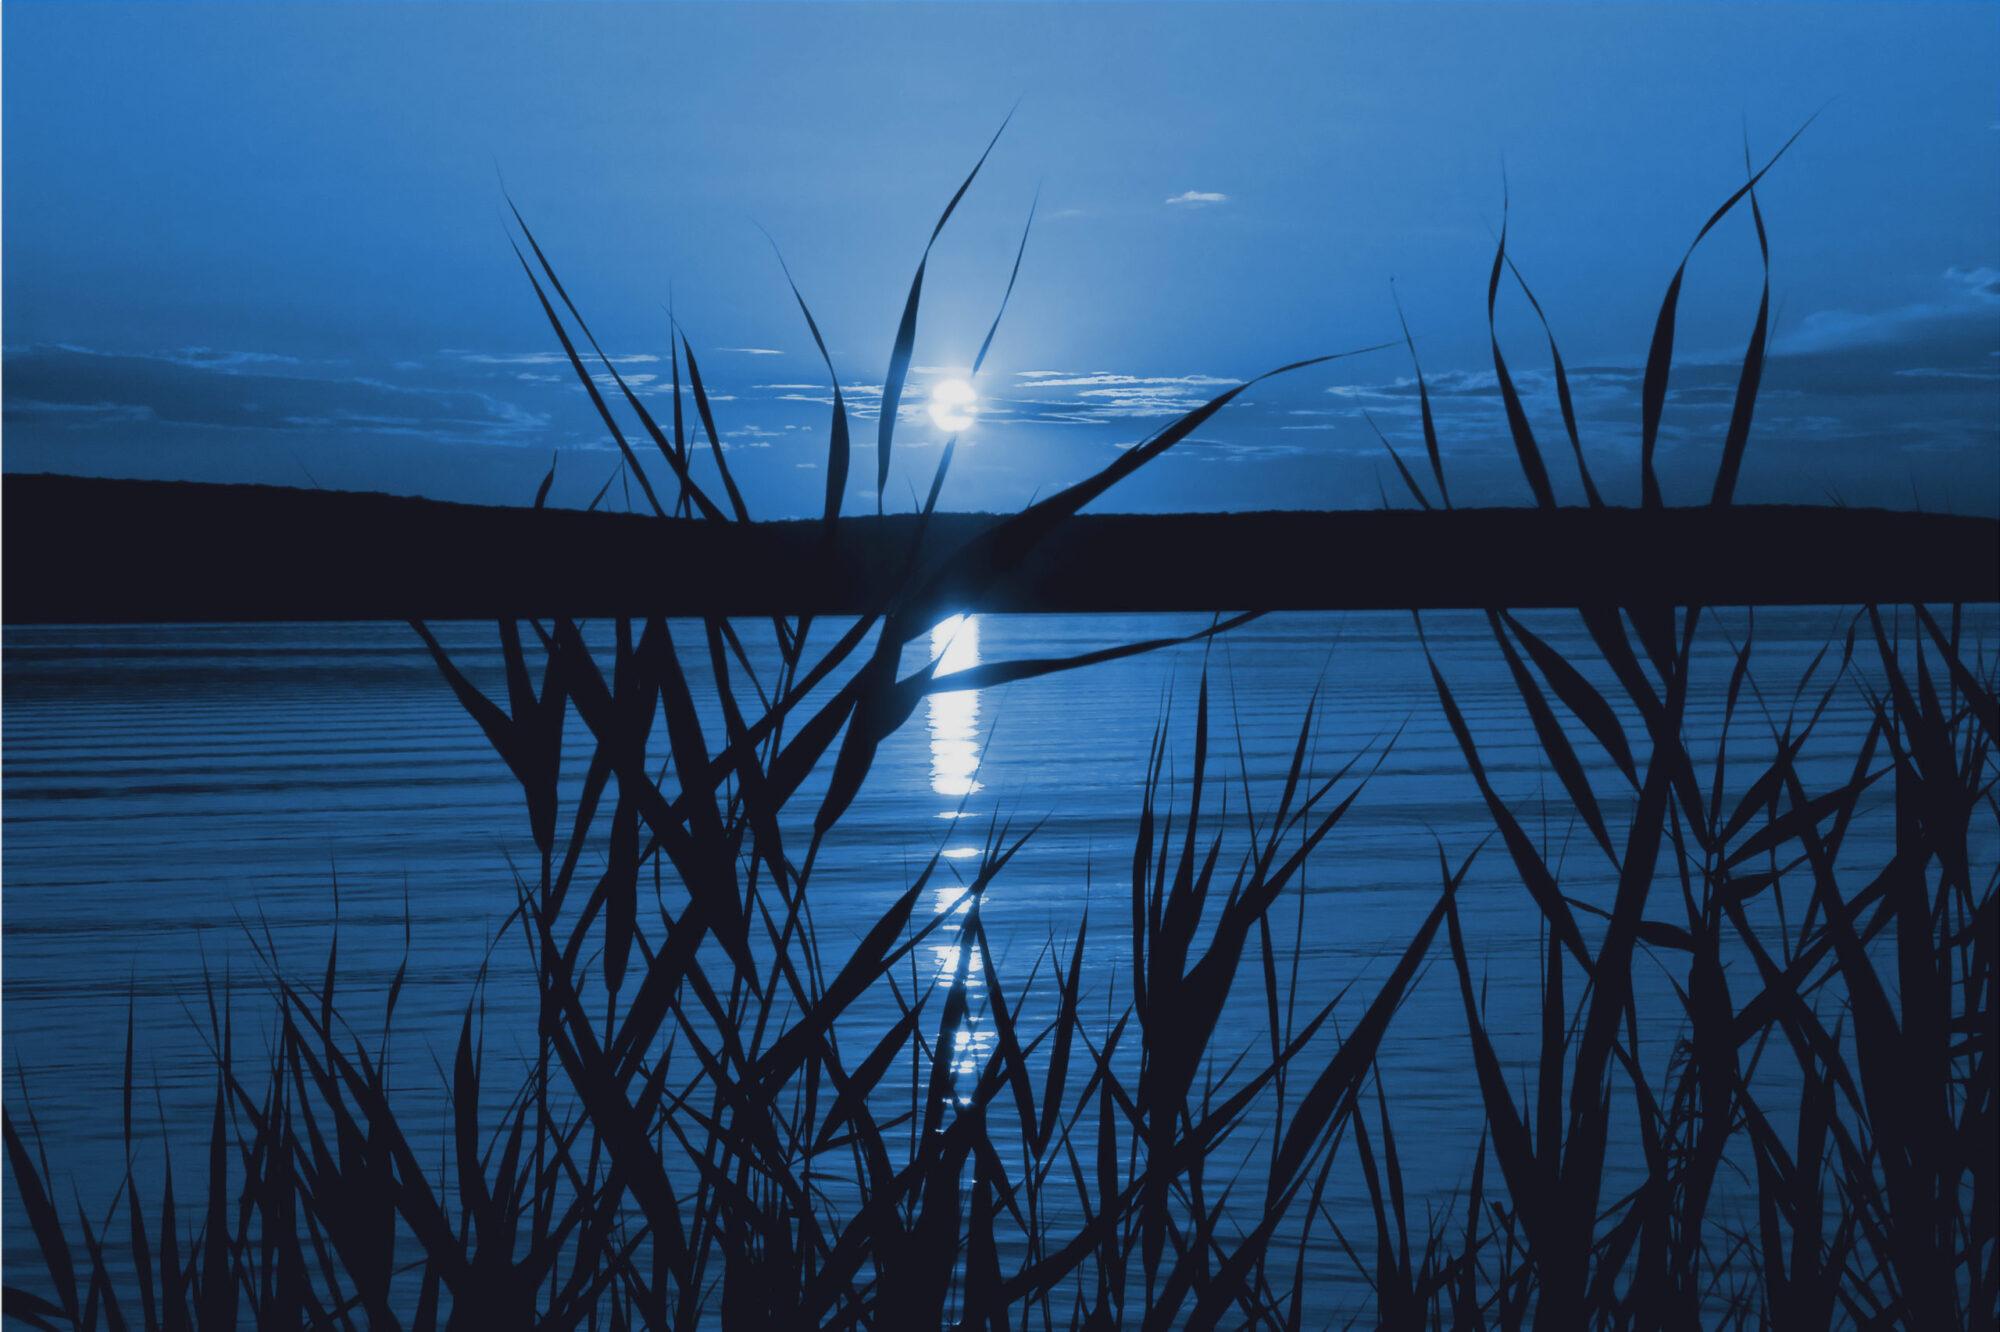 Moon shining on river through tall grass